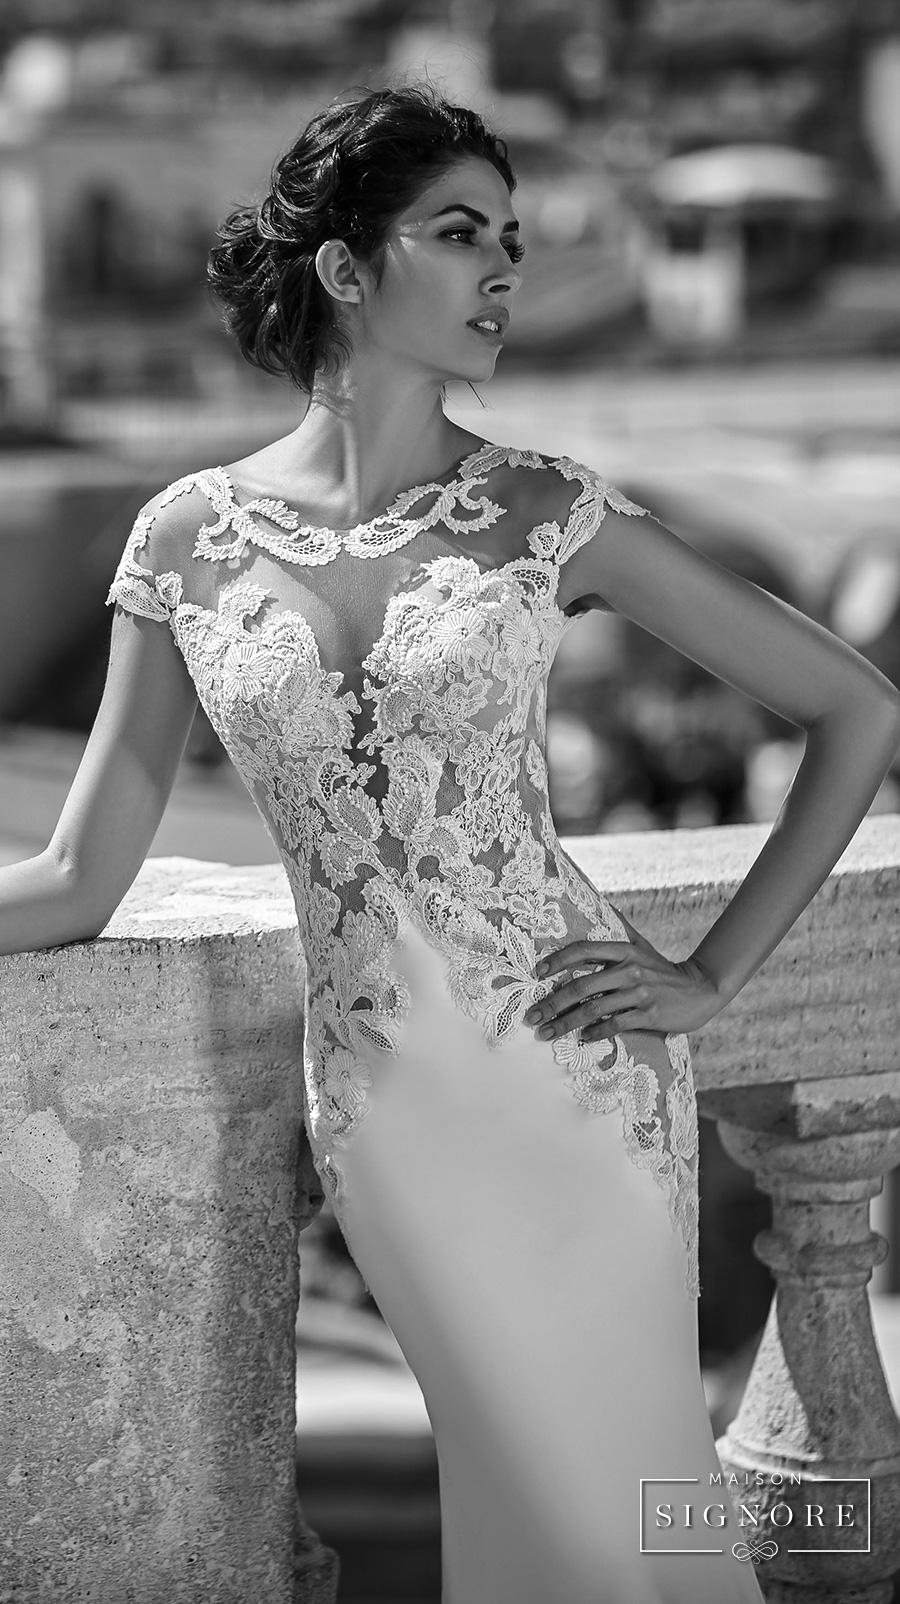 maison signore valeria marini seductions long sleeves wedding gown 4